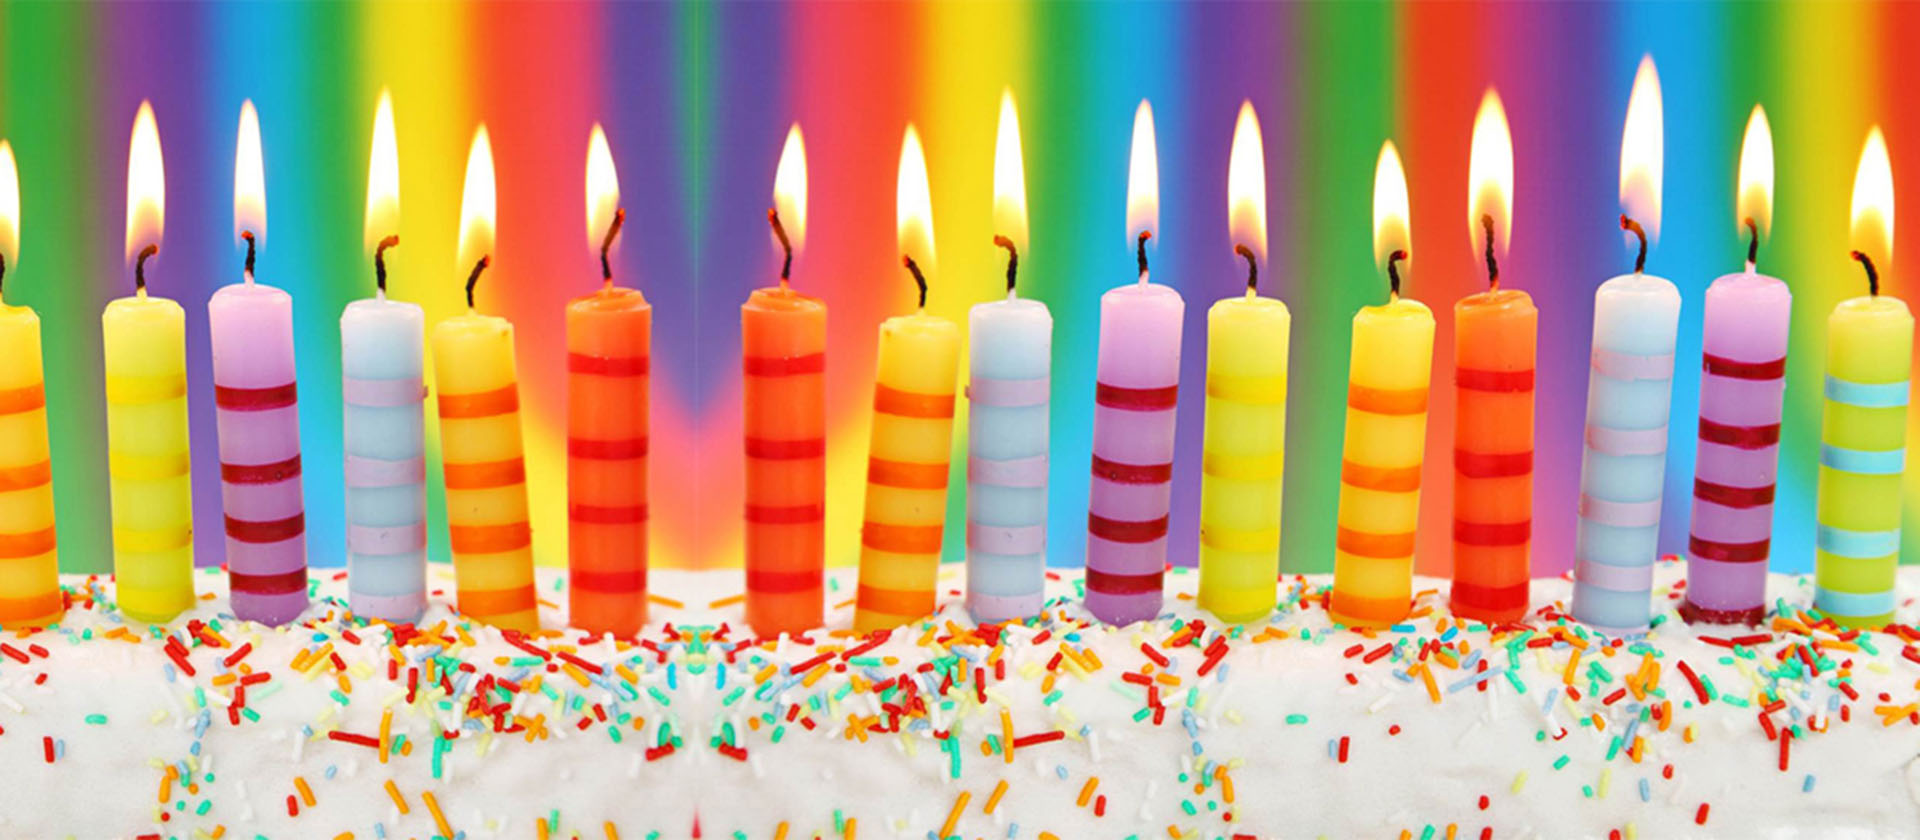 background banner birthday cake candle  birthday  cake